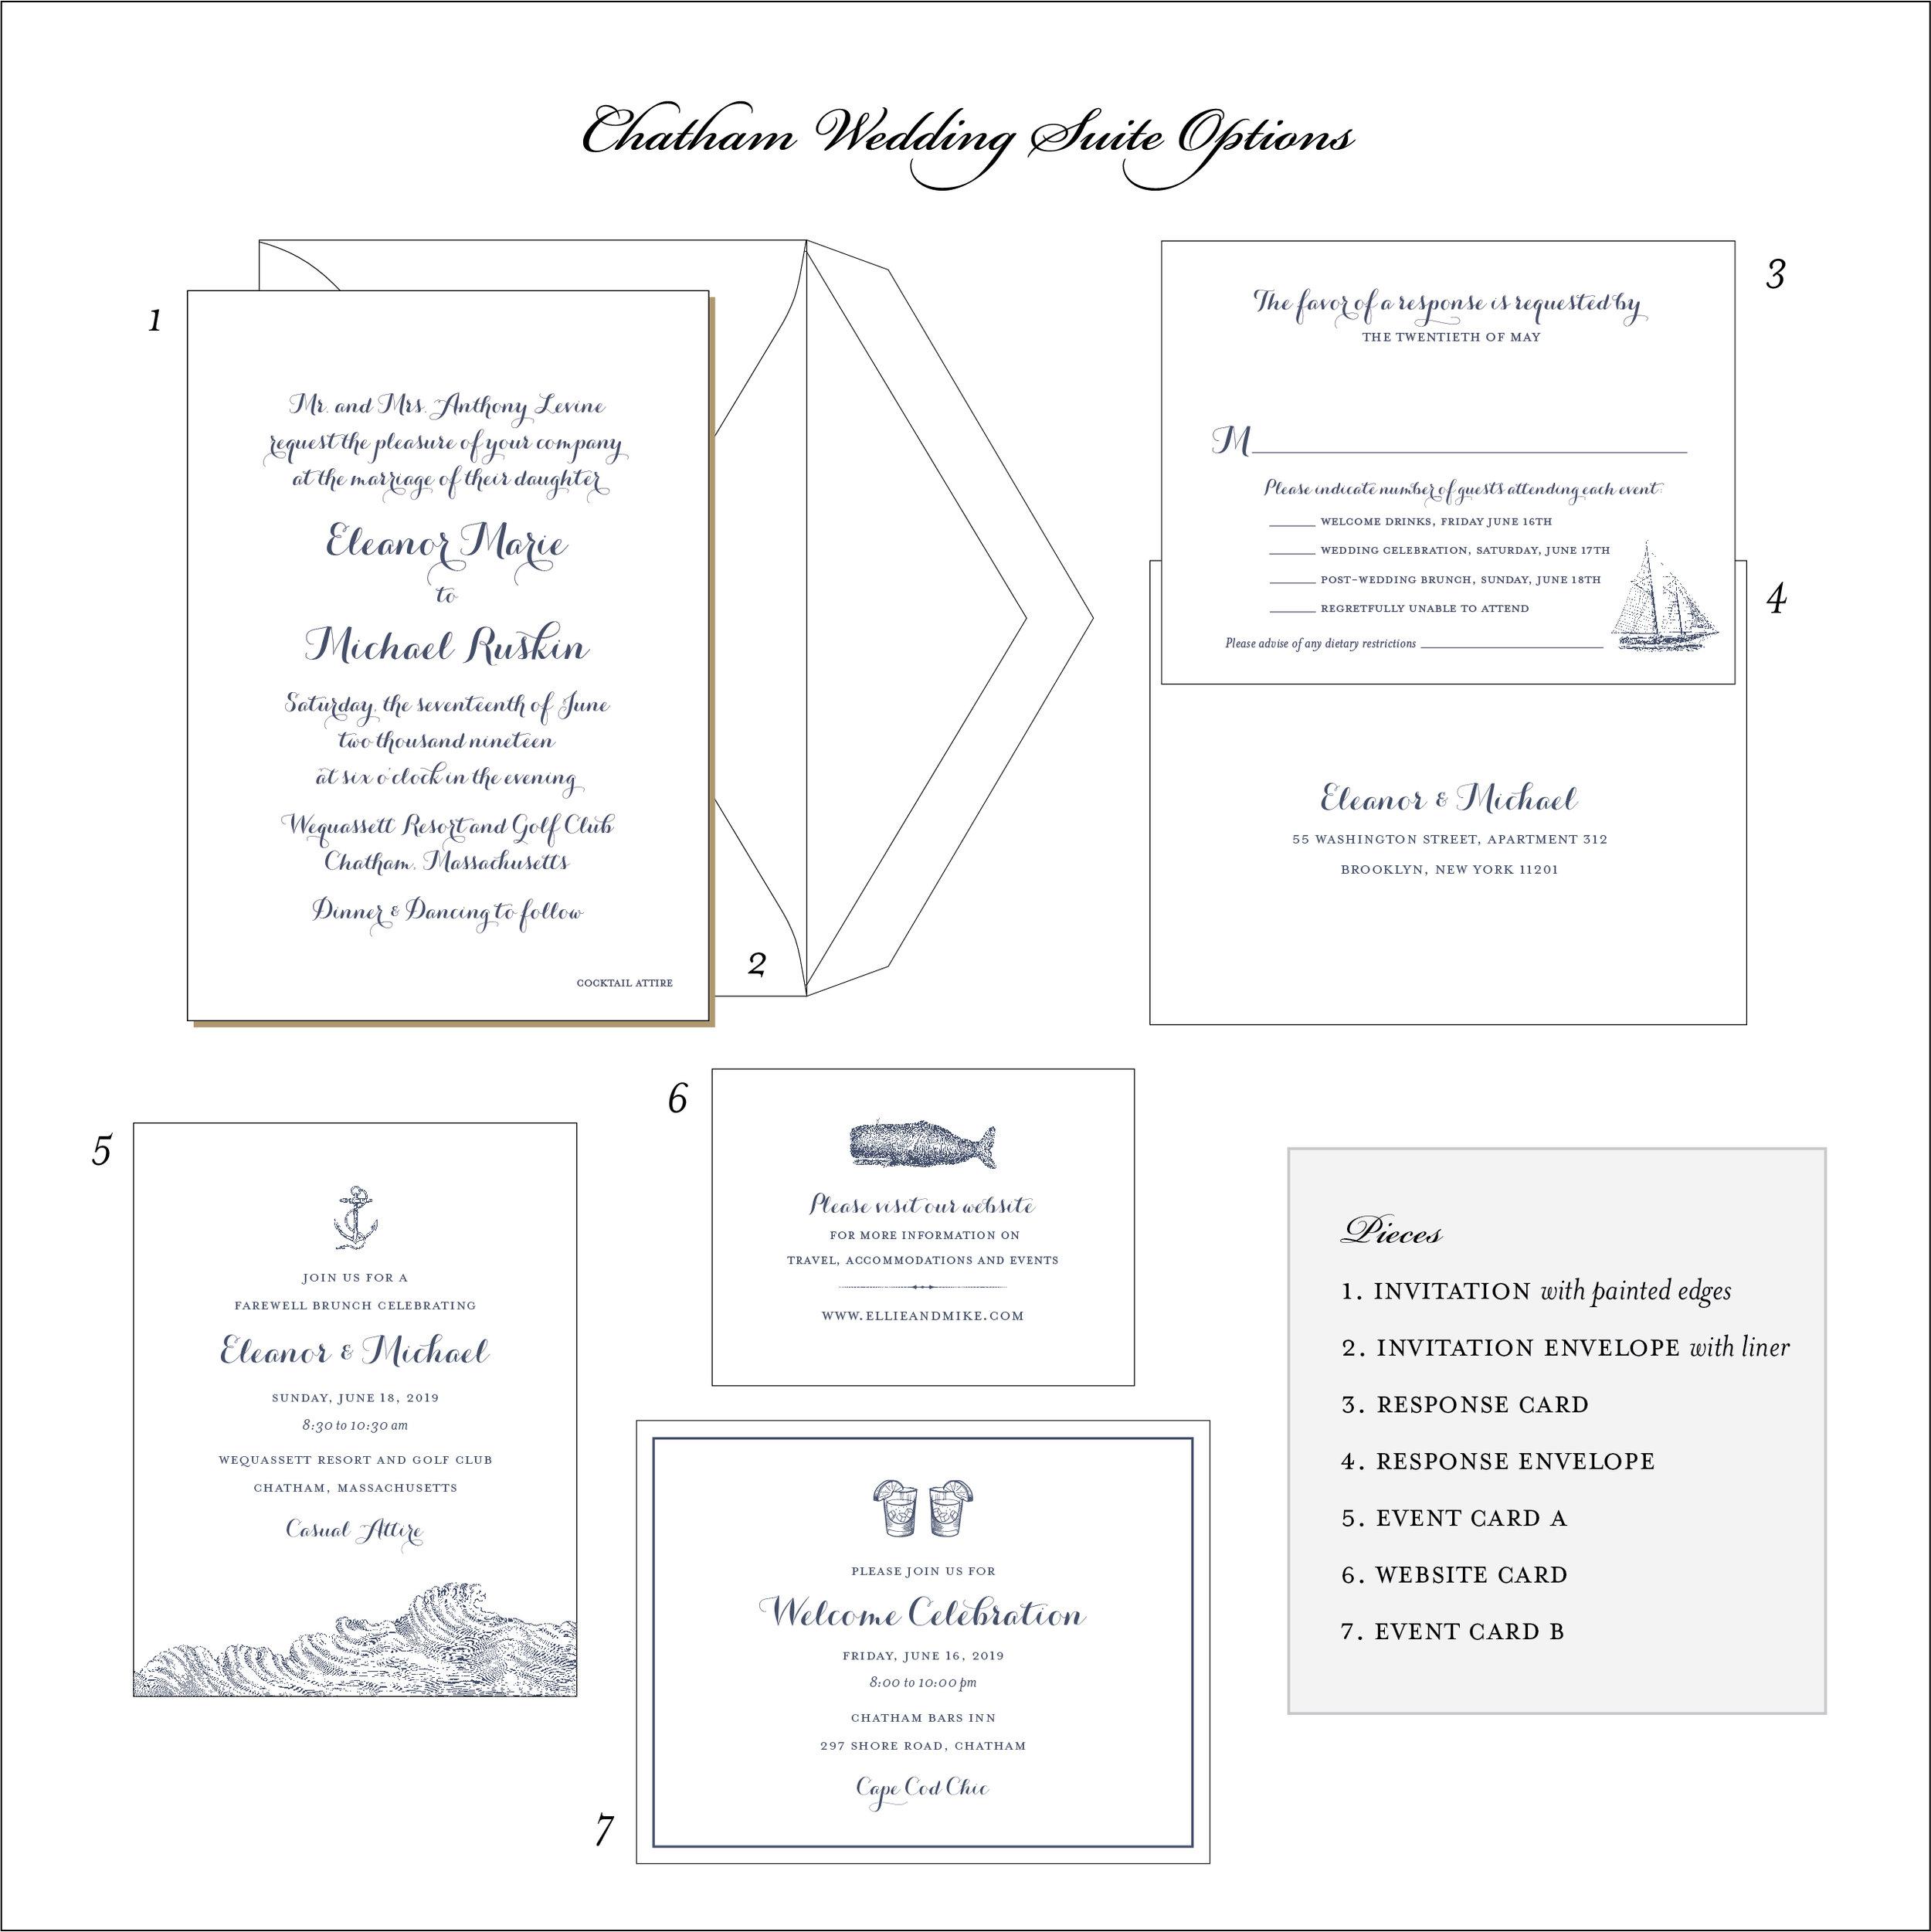 Website_Invite_Options-CHATHAM-A.jpg